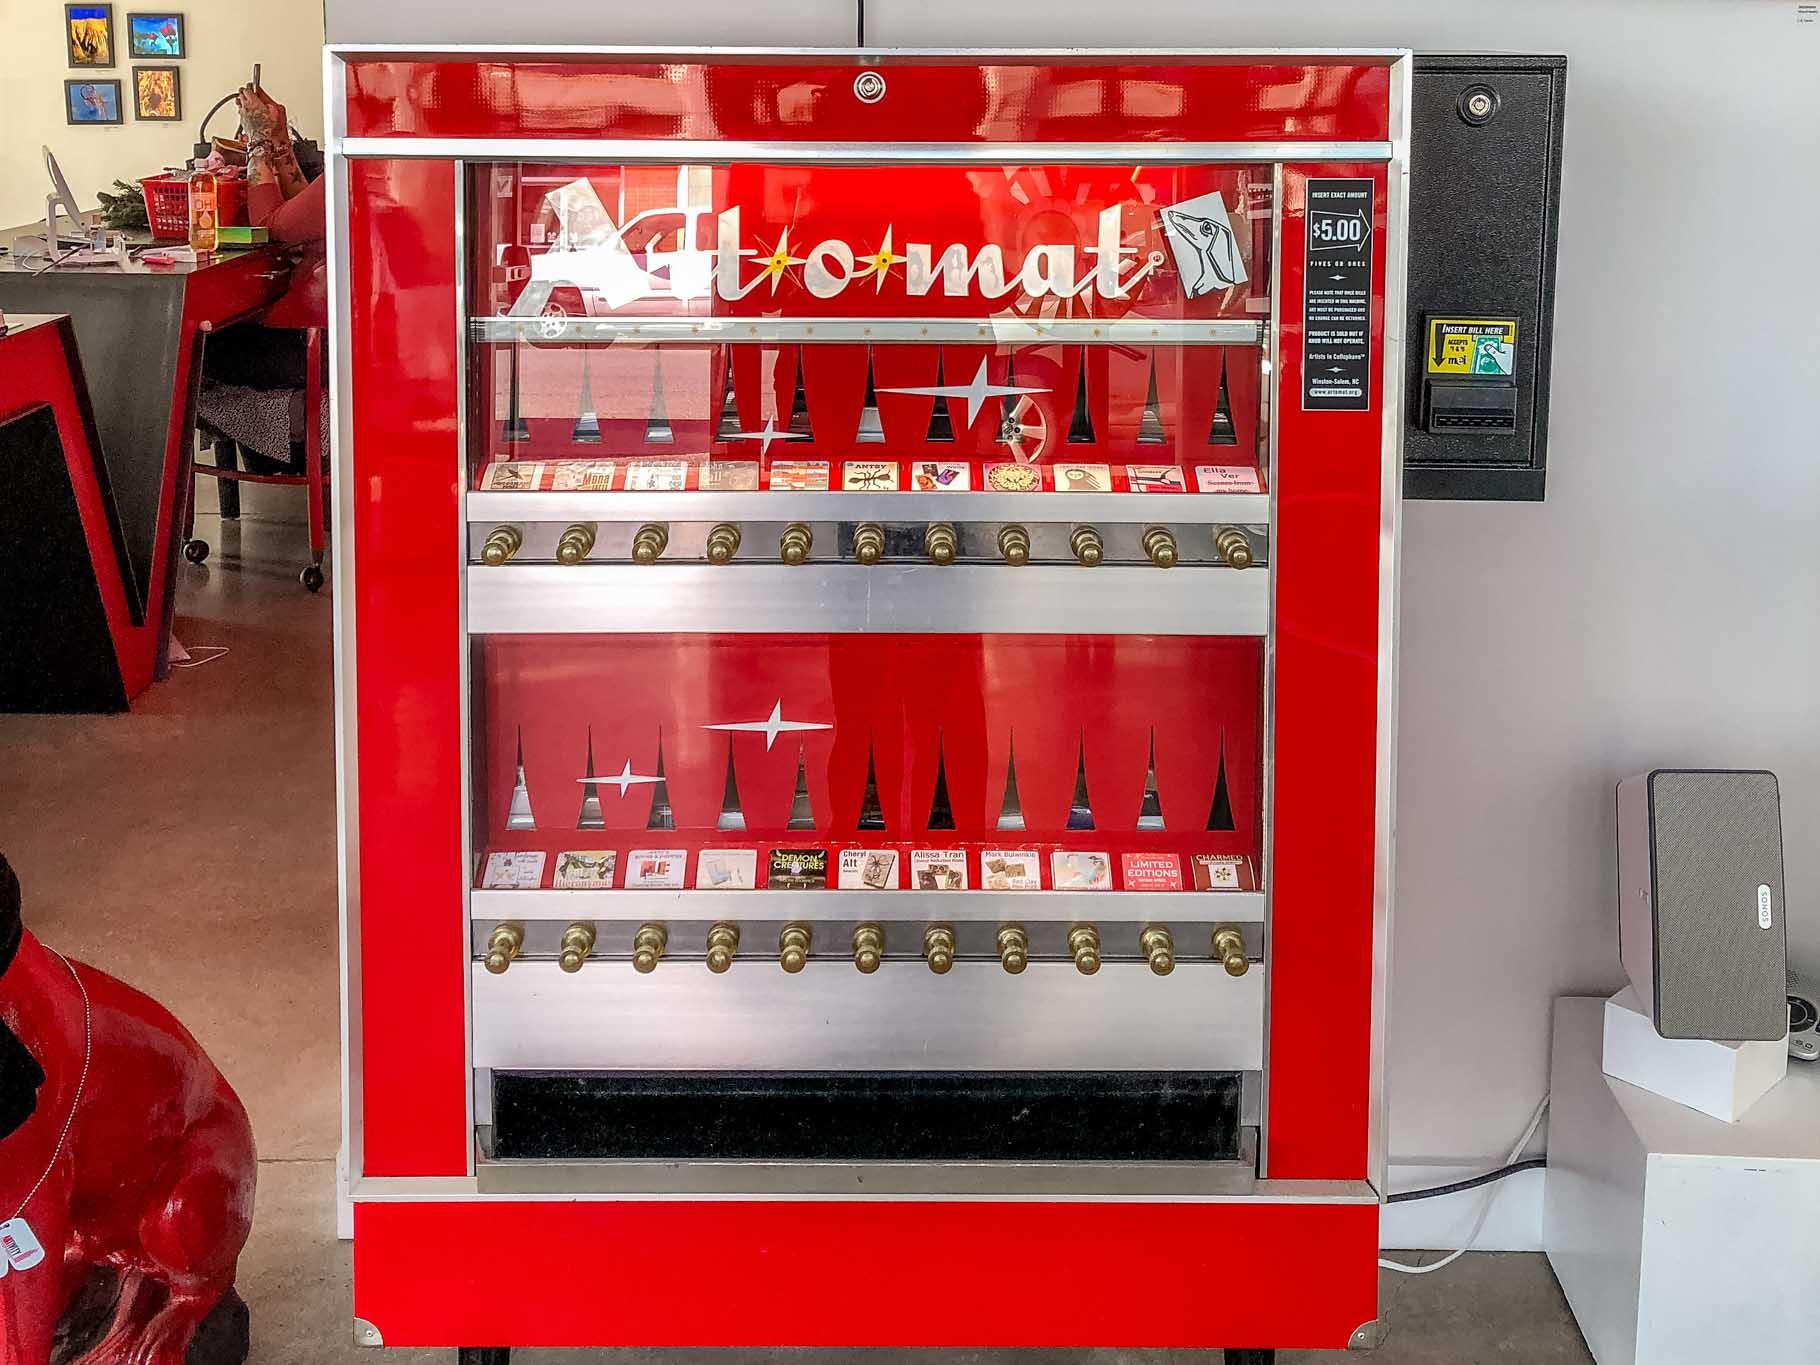 Art-o-Mat, an old-fashioned cigarette machine that dispenses art